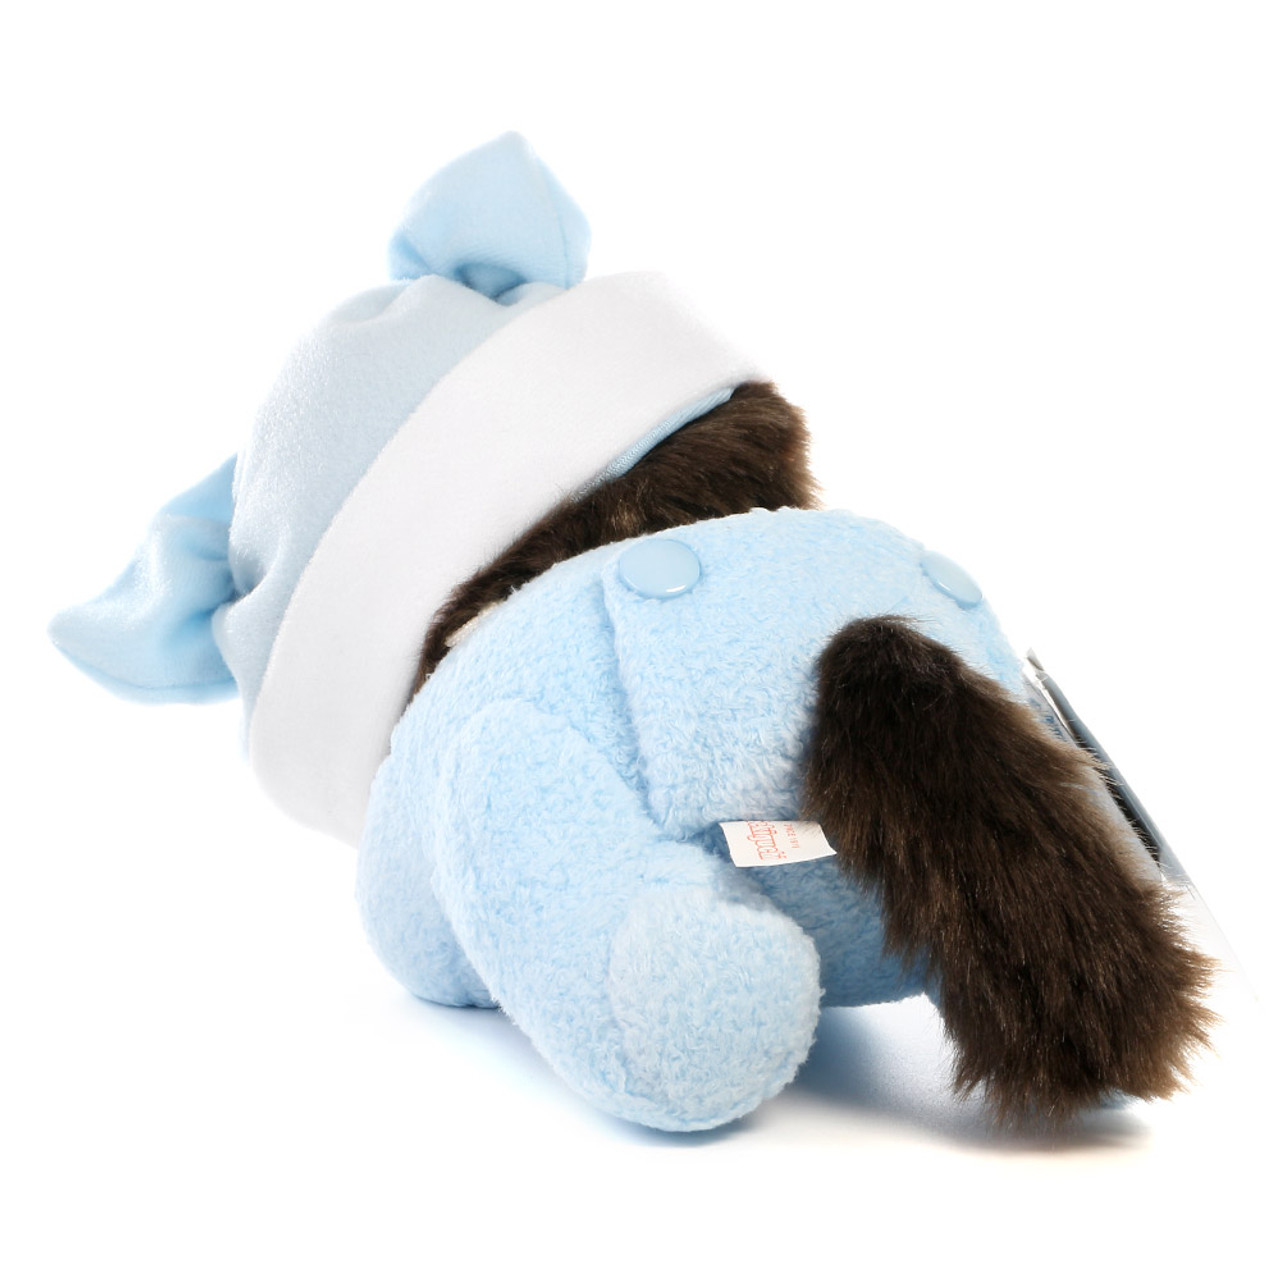 Sekiguchi Bebichhichi Monkey Boy Baby Blue Shirt Crawling Plush Doll - Medium ( Back View )